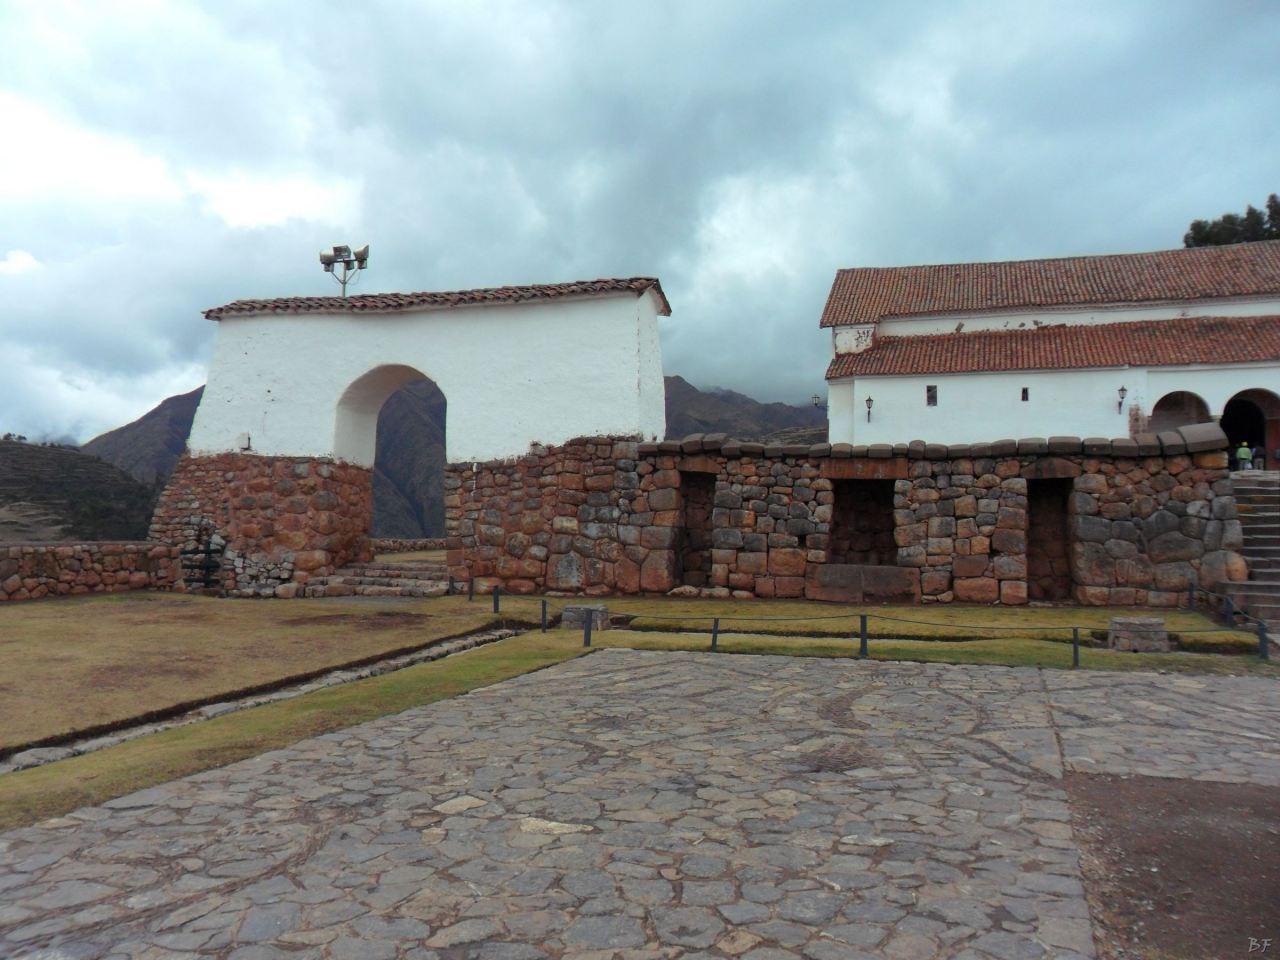 Chinchero-Mura-Poligonali-Piramide-Urubamba-Peru-20